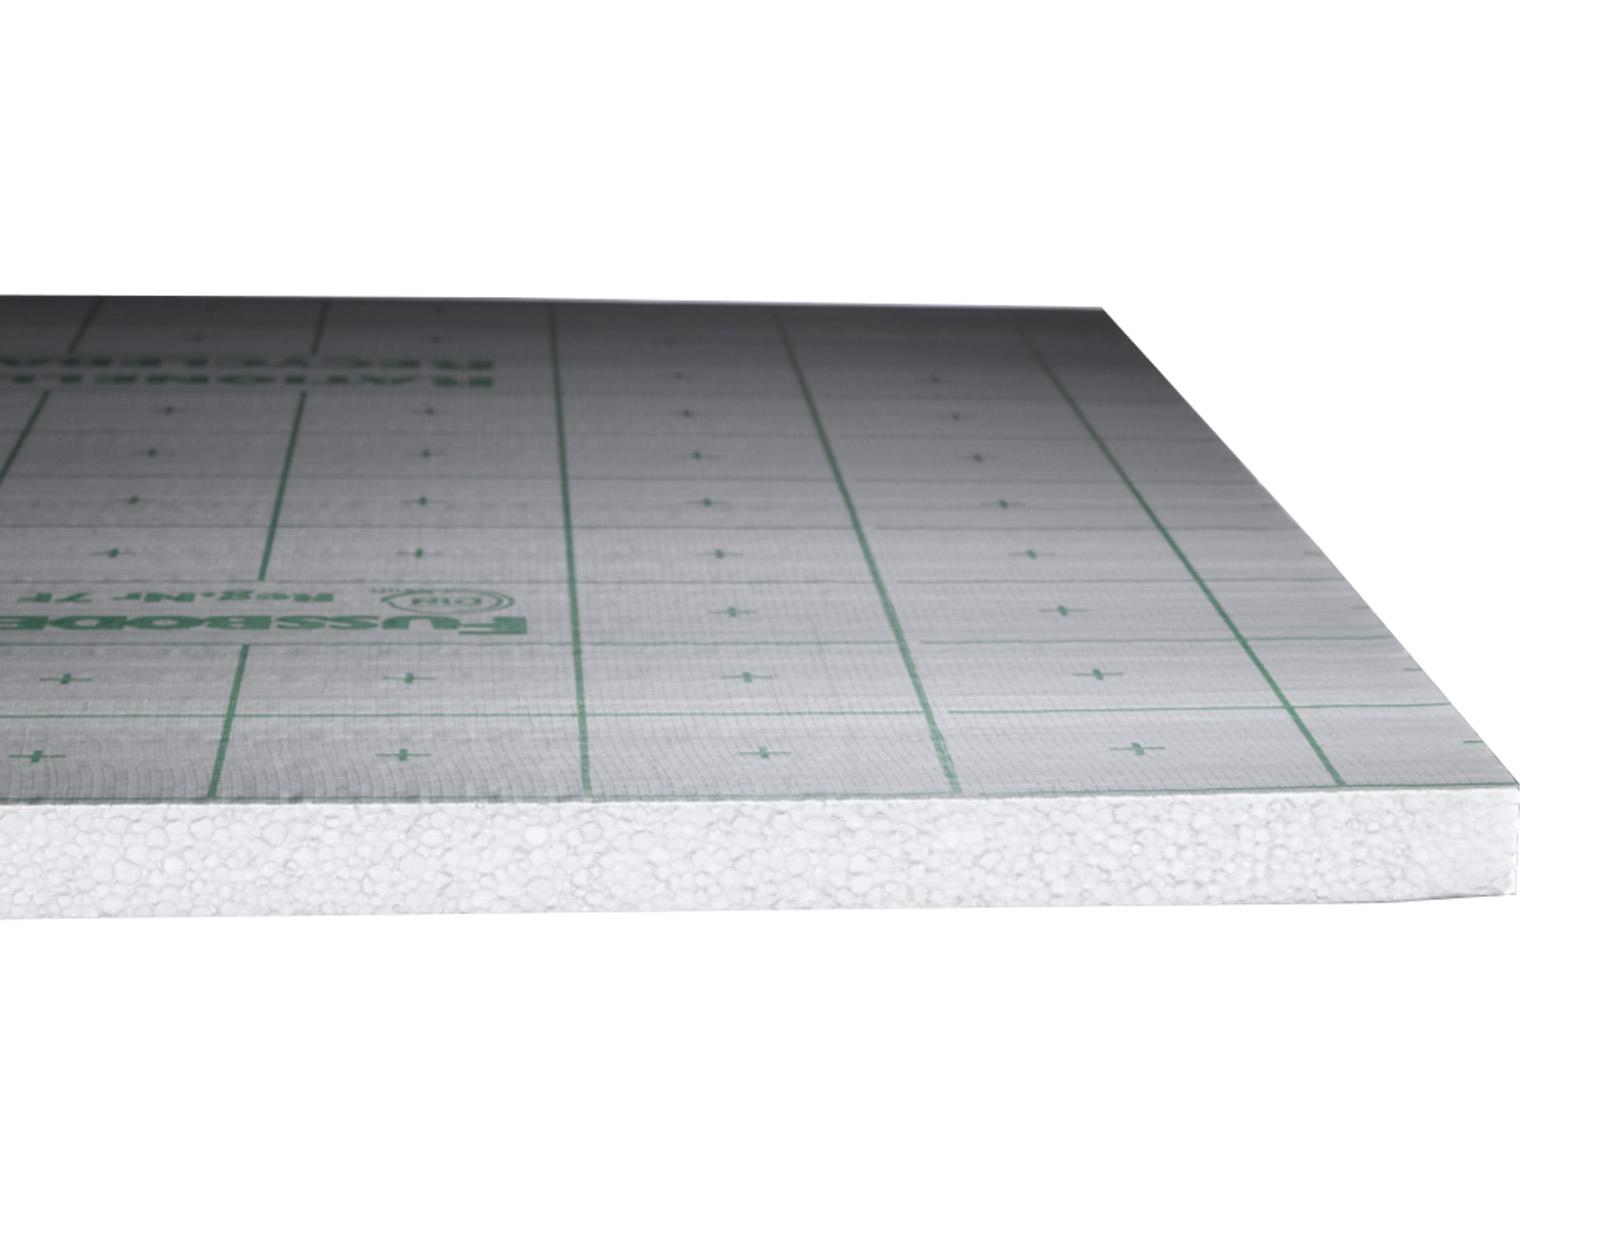 empur verbundplatte exclusiv pur-pe 14 23 33 fußbodenheizung 10m²